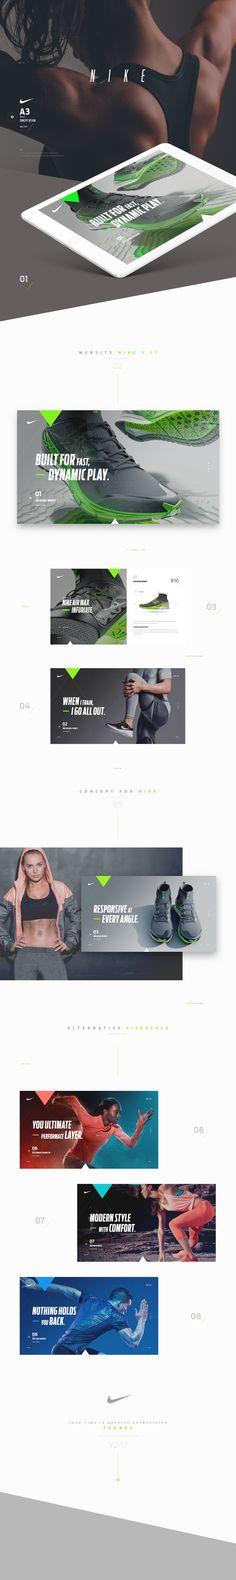 Nike on Behance Website Design Layout, Web Design Tips, Layout Design, Webpage Layout, Online Workout Videos, Sports Website, Behance, Branding, Web Banner